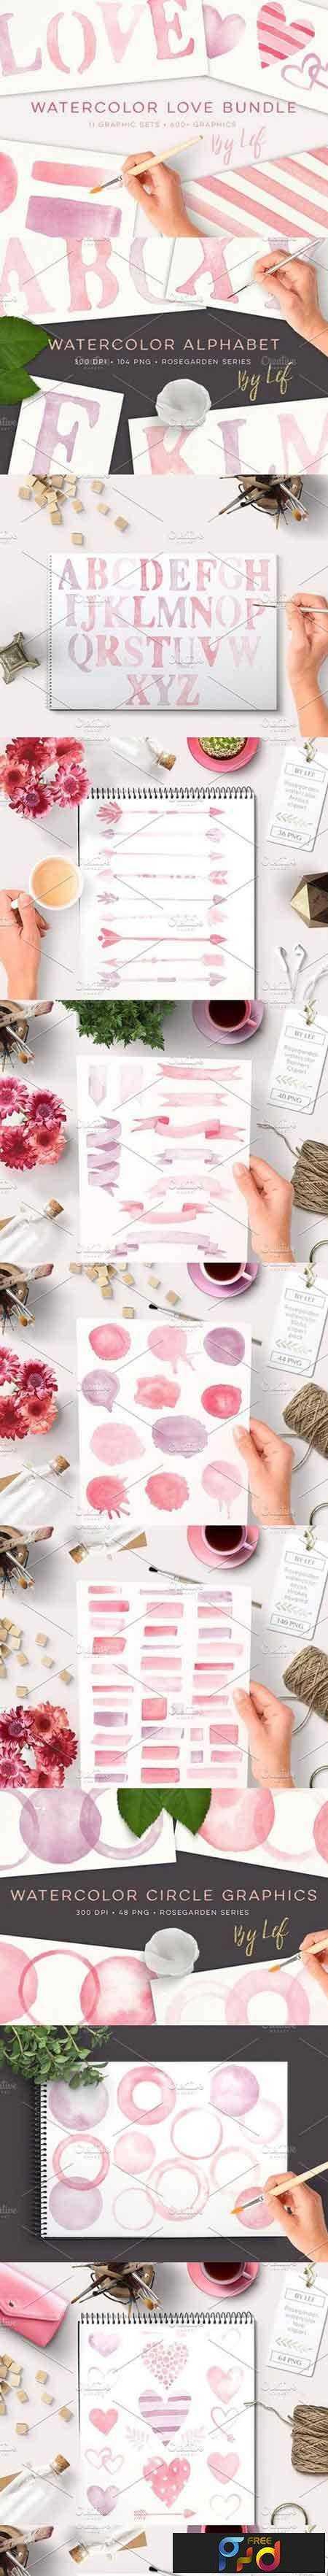 FreePsdVn.com_1702512_STOCK_watercolor_valentine_limited_bundle_1200404